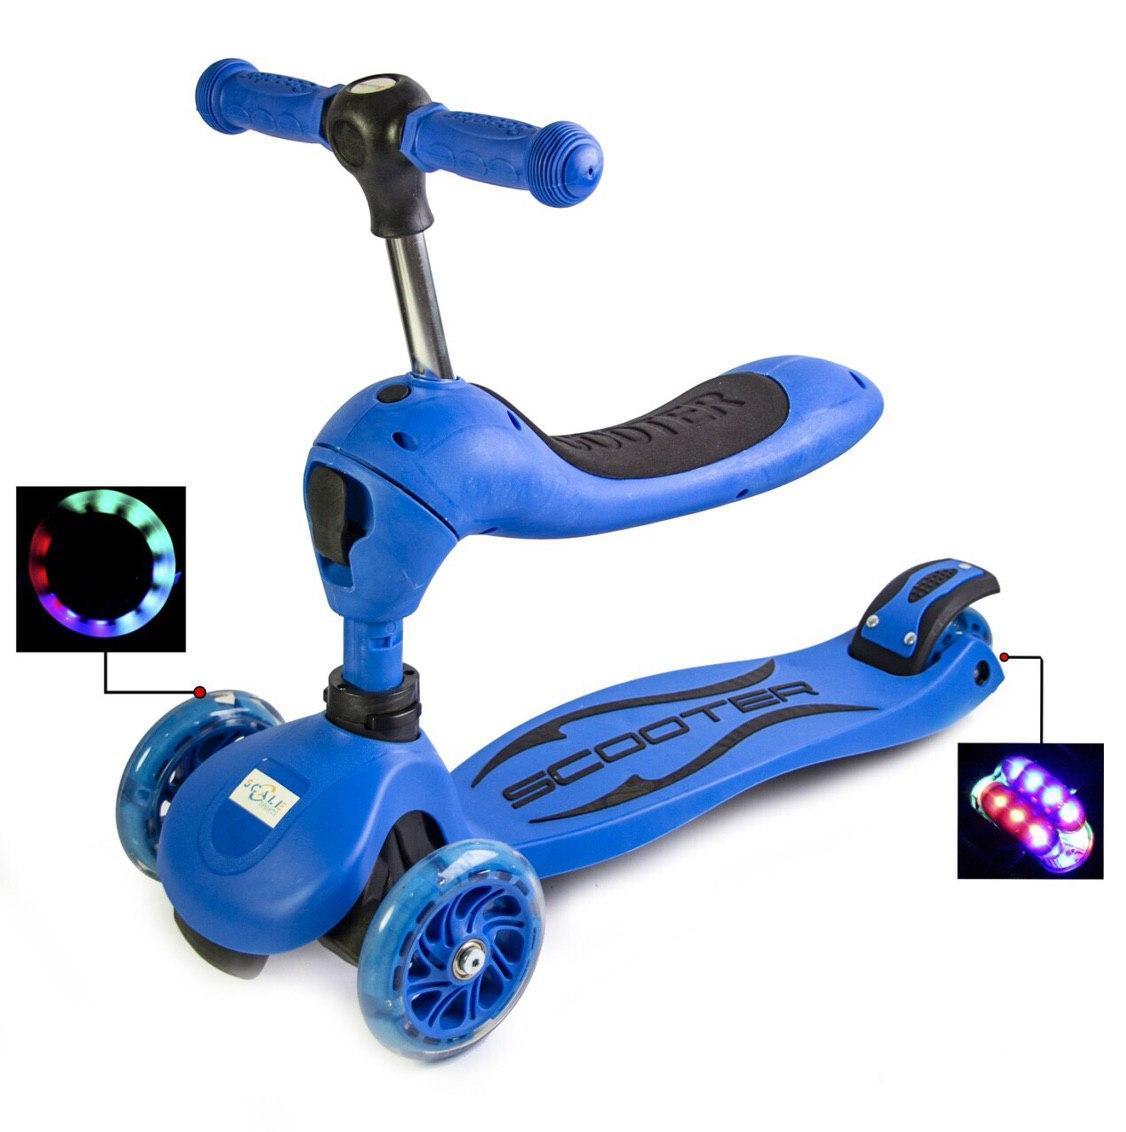 Самокат-трансформер Scale Sports. Blue.